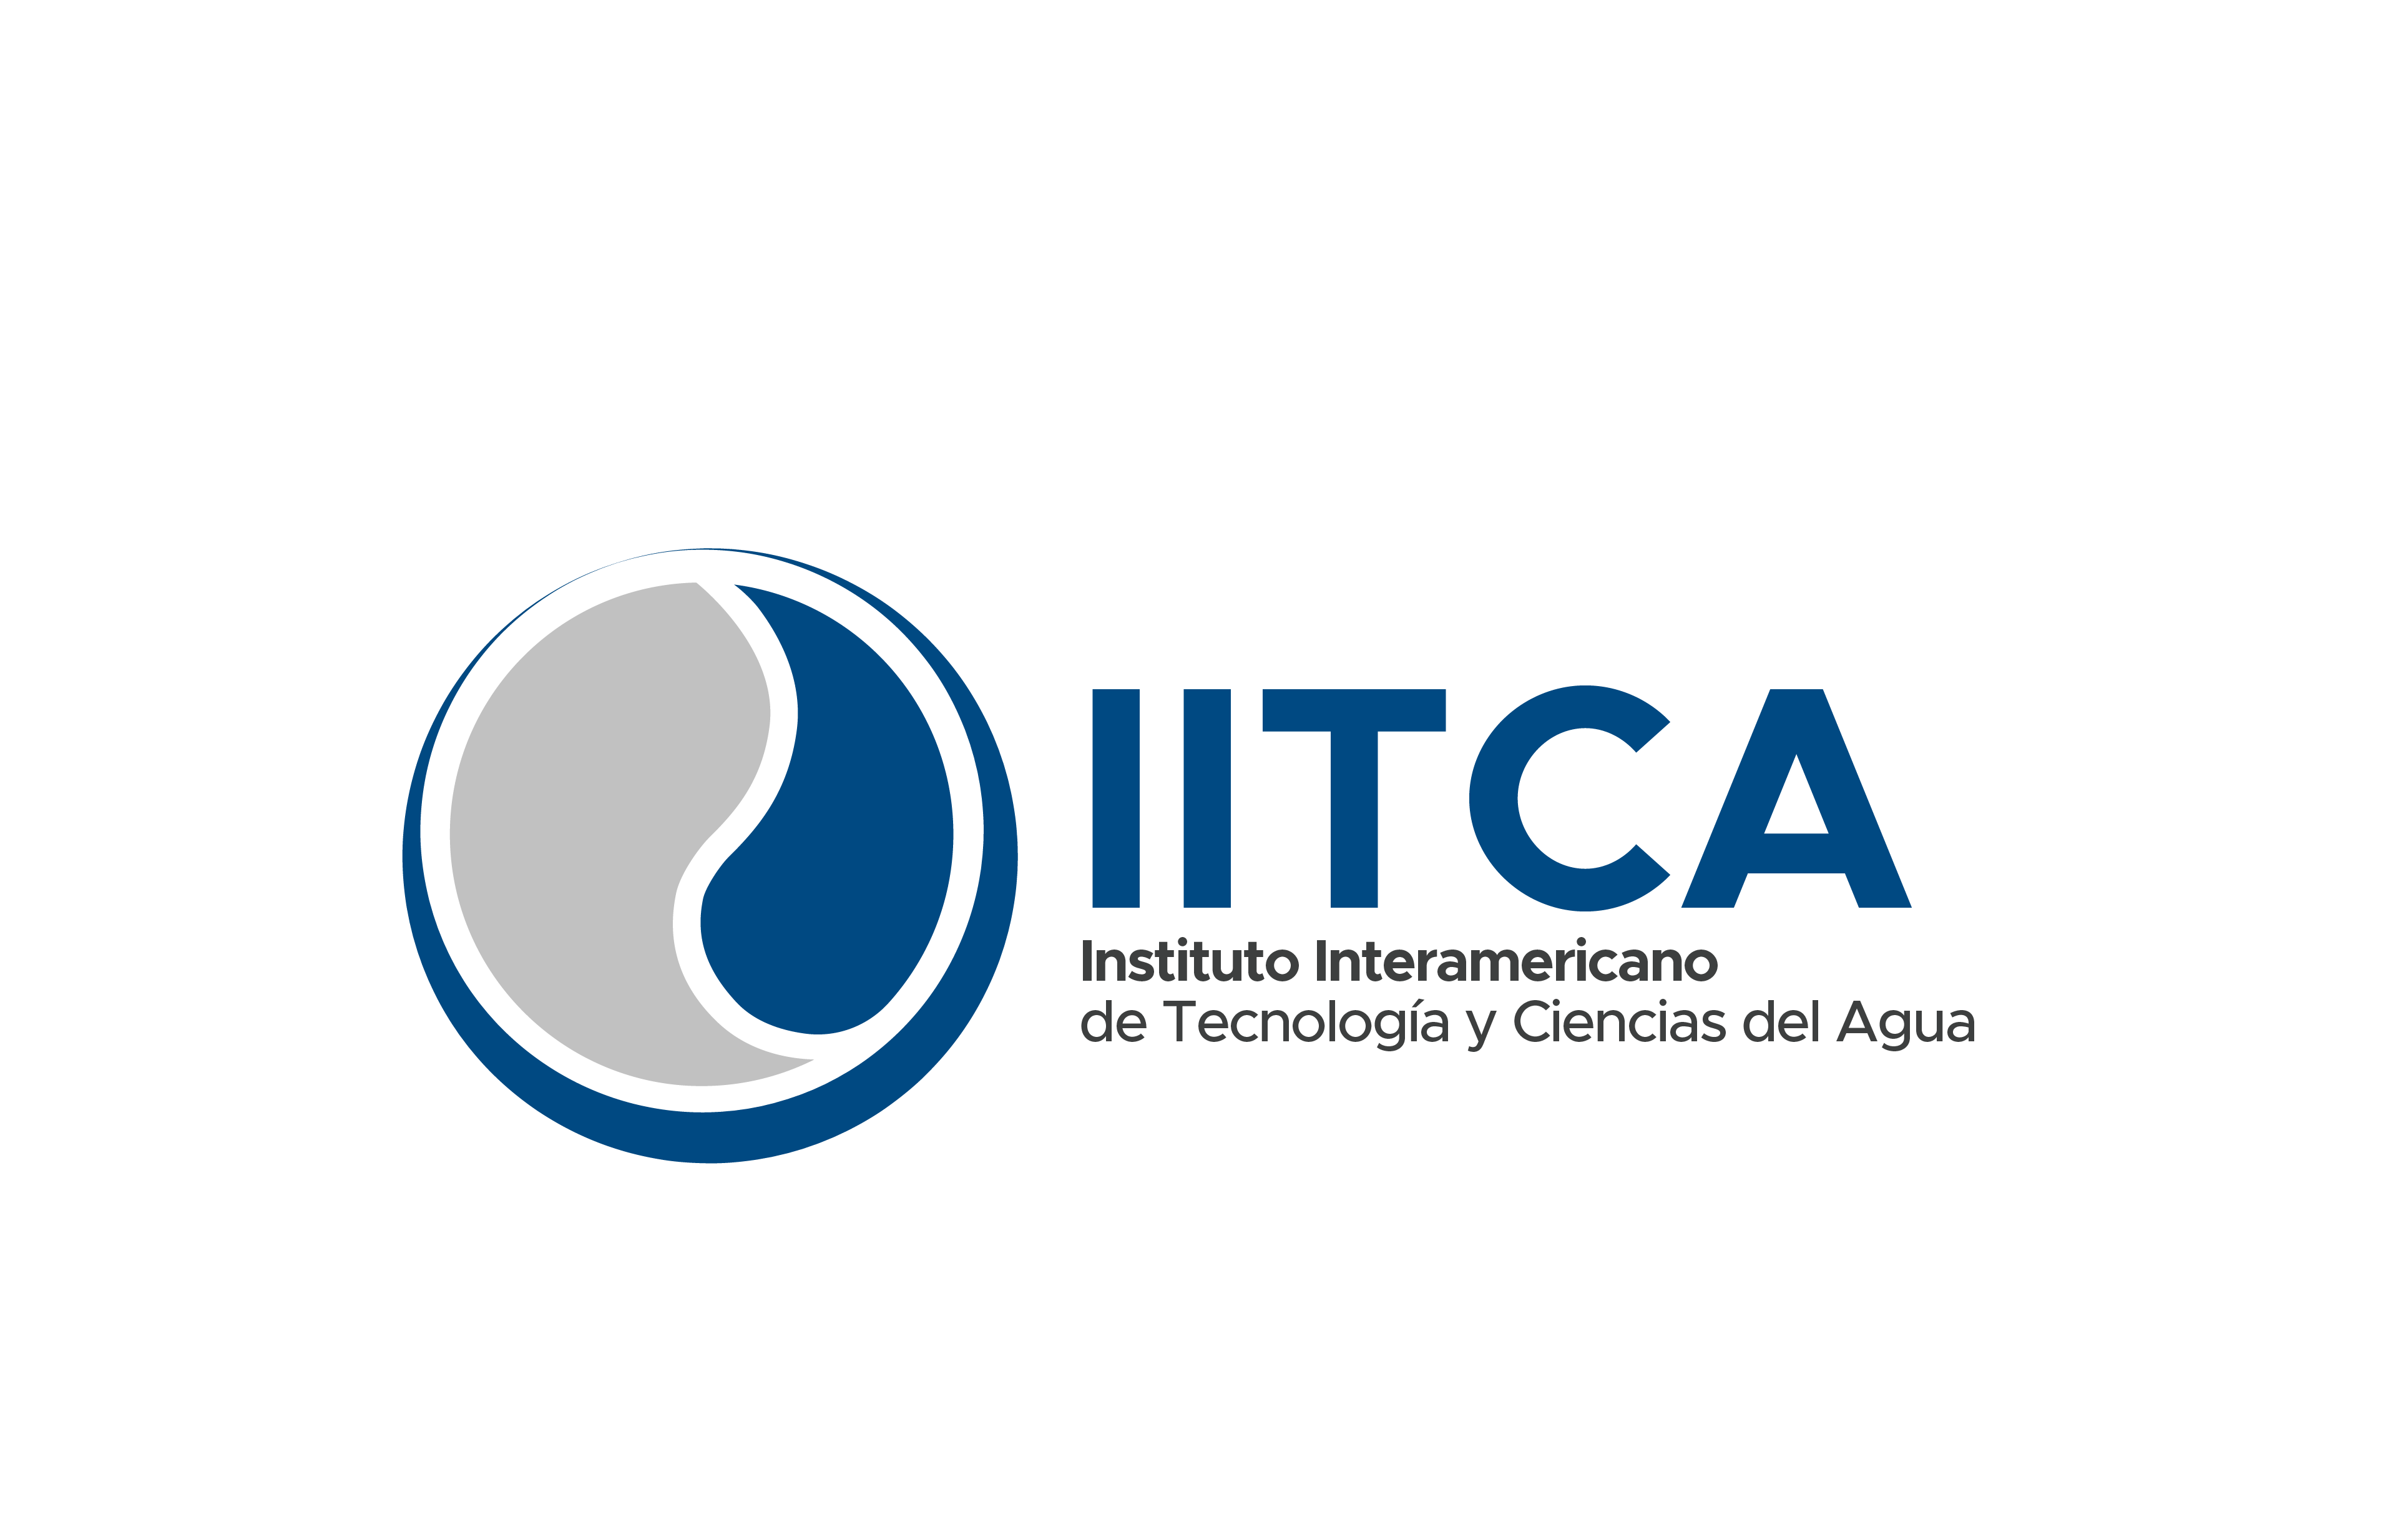 LOGO IITCA (1)